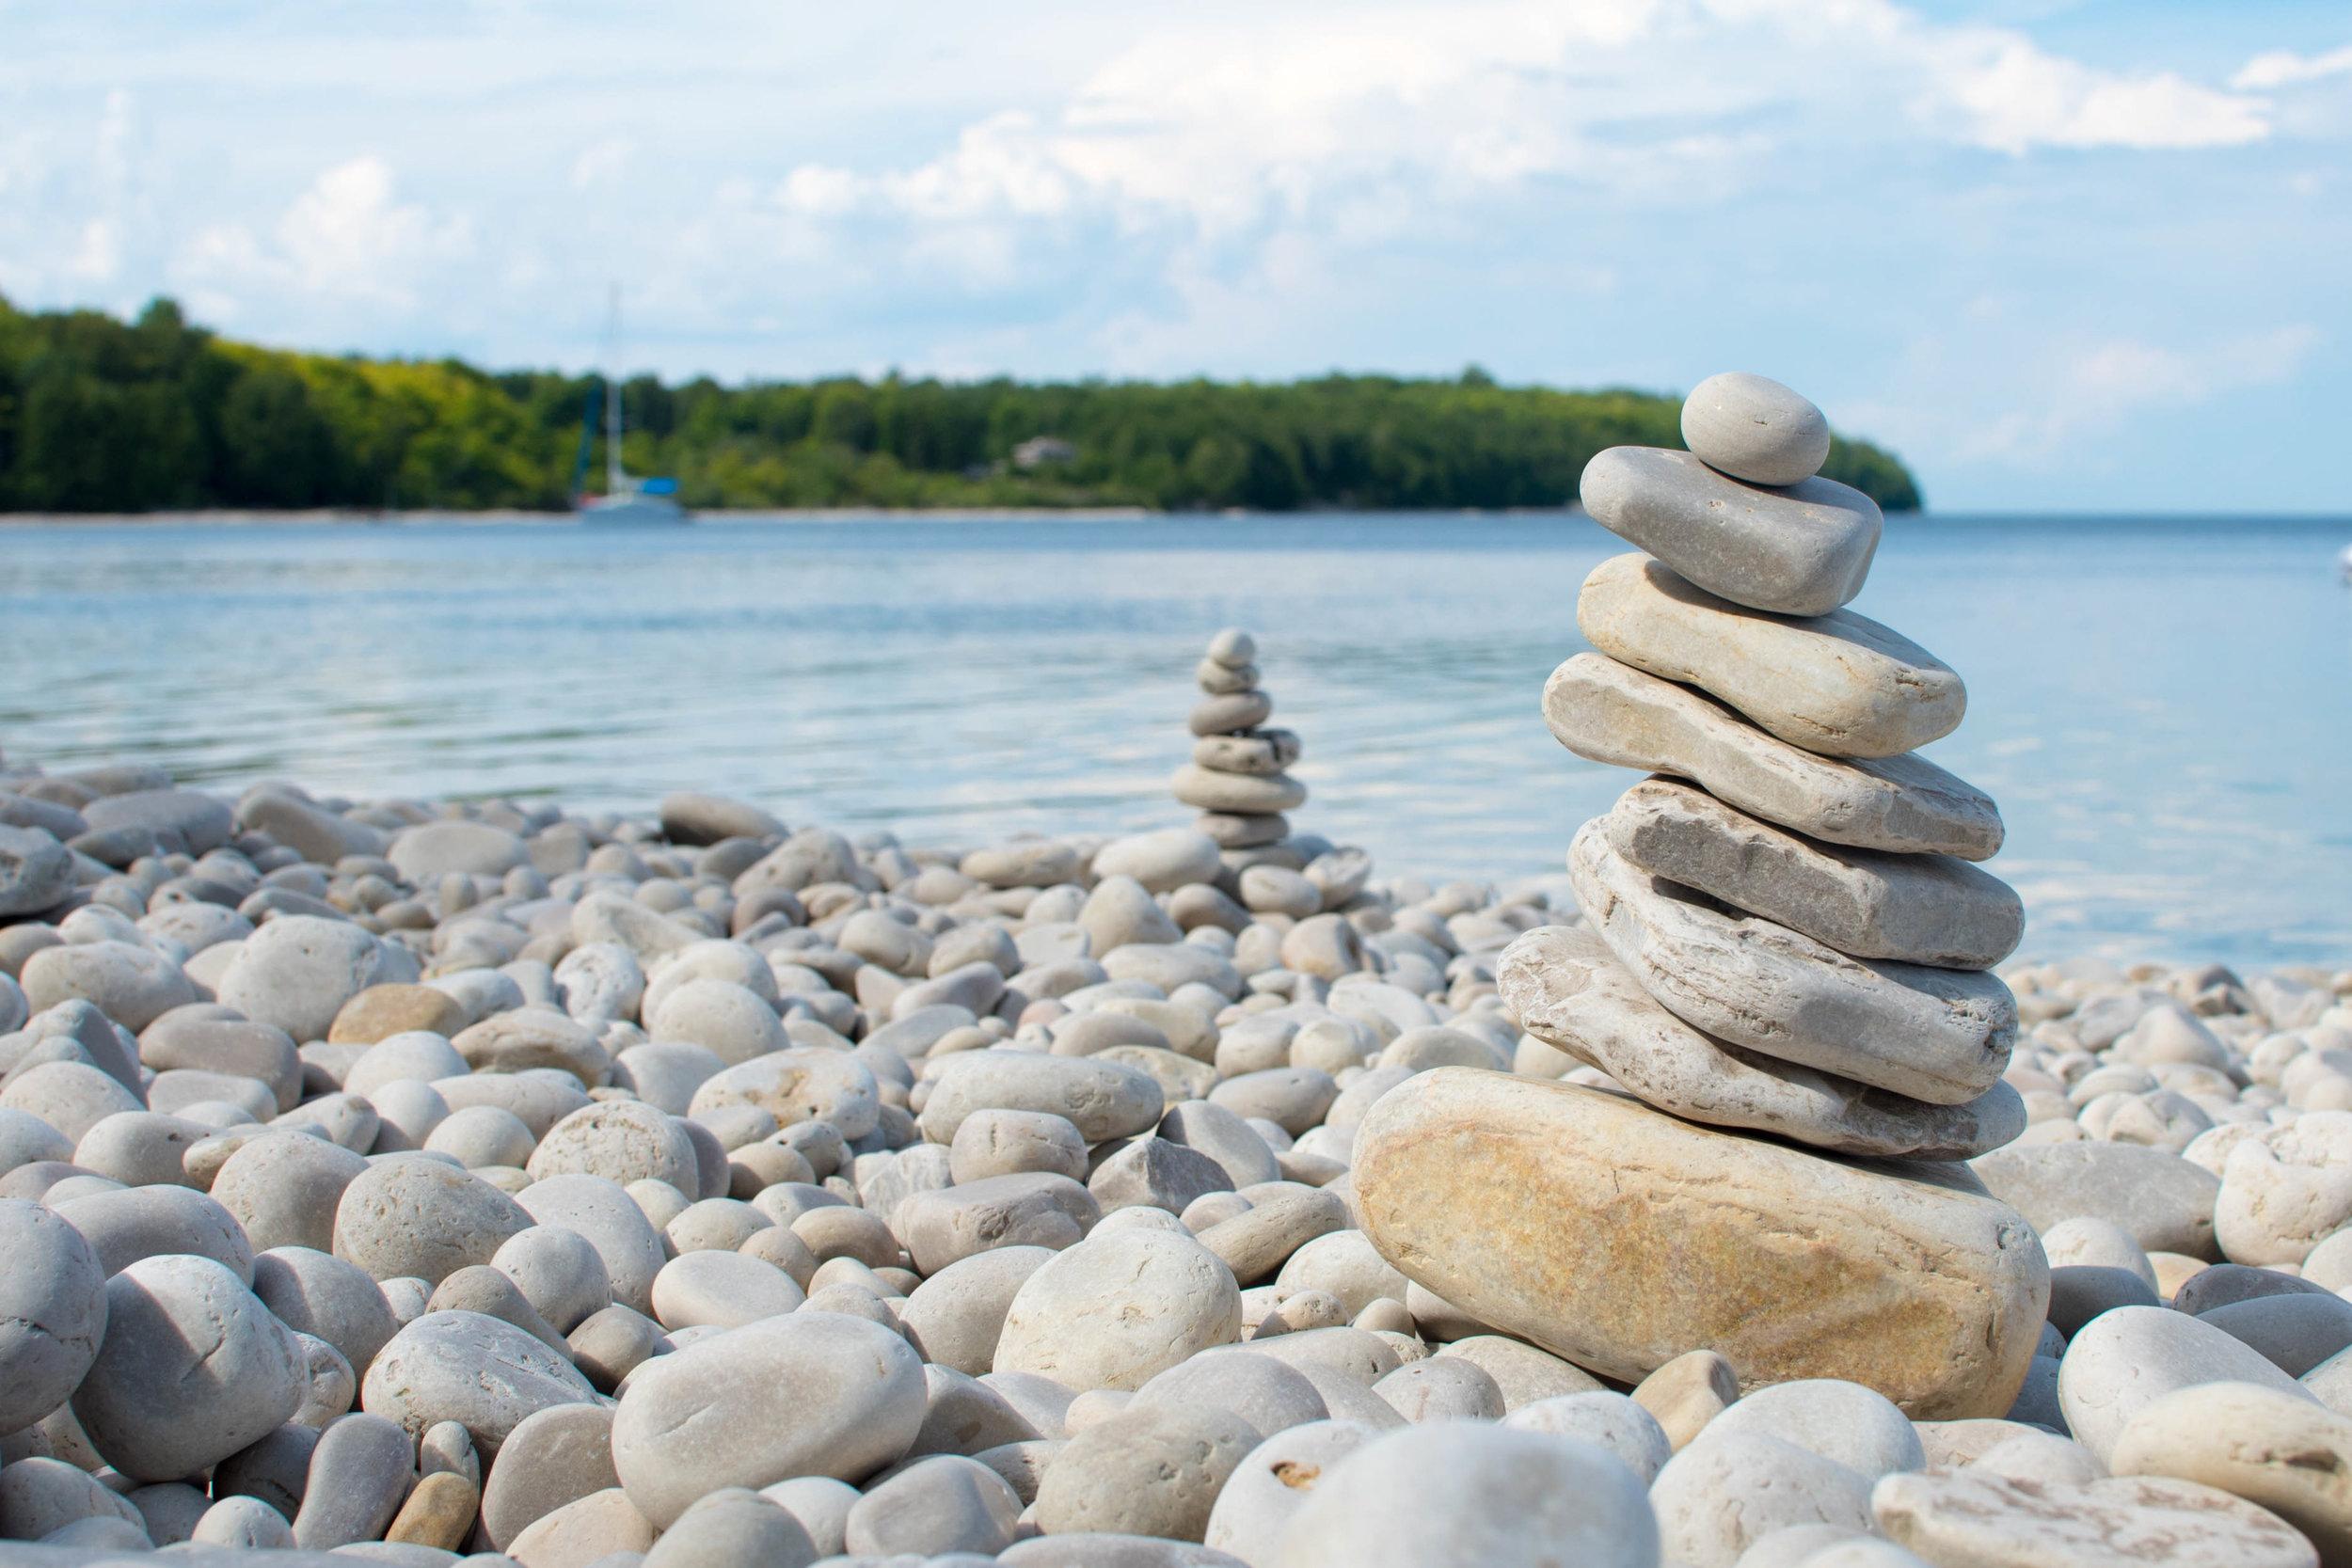 Rocks stacked up on school house beach, washington Island Wisconsin